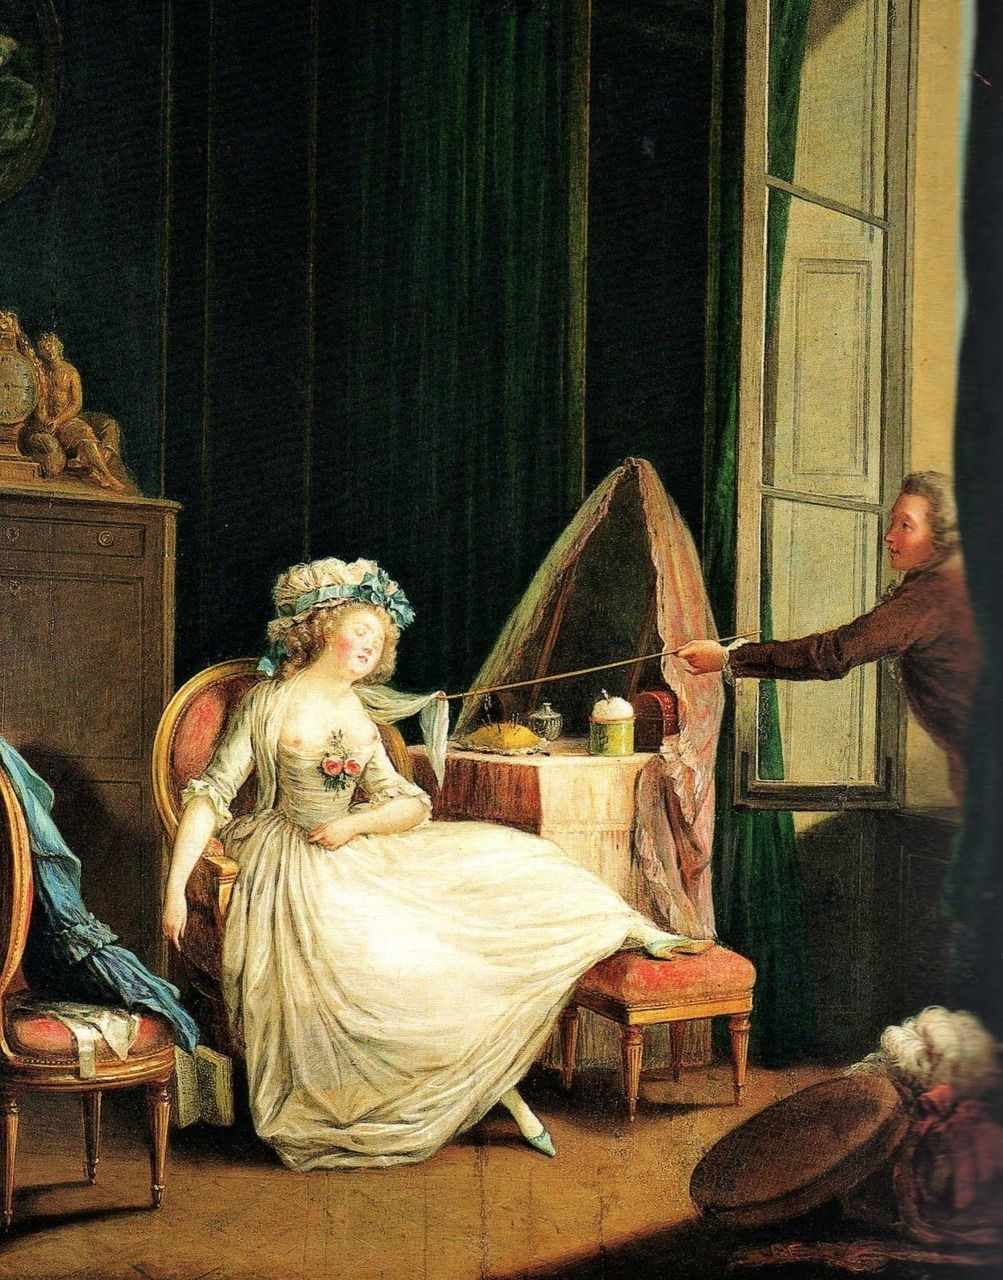 Nicolas Lavreince (1737-1807) - Frivolous love